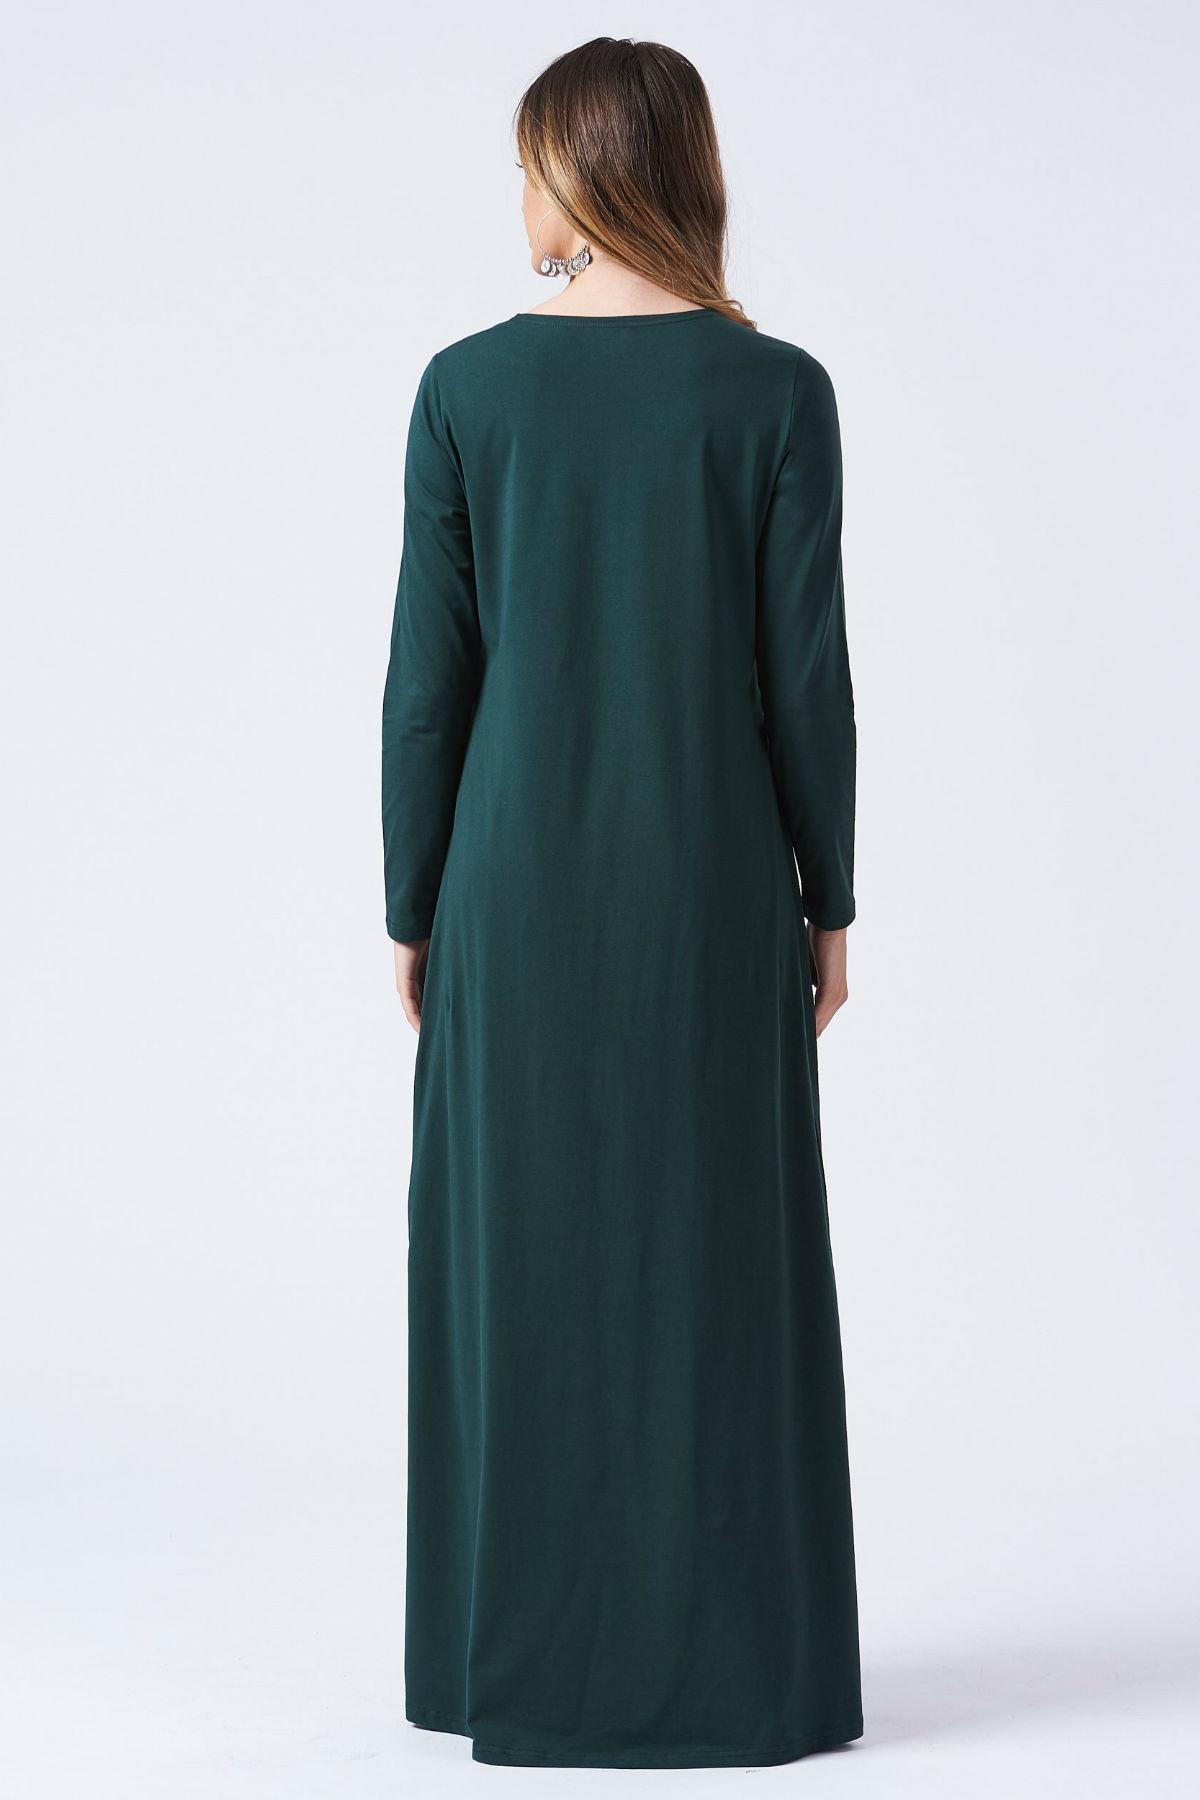 Sara Maxi Klänning Mörk Grön